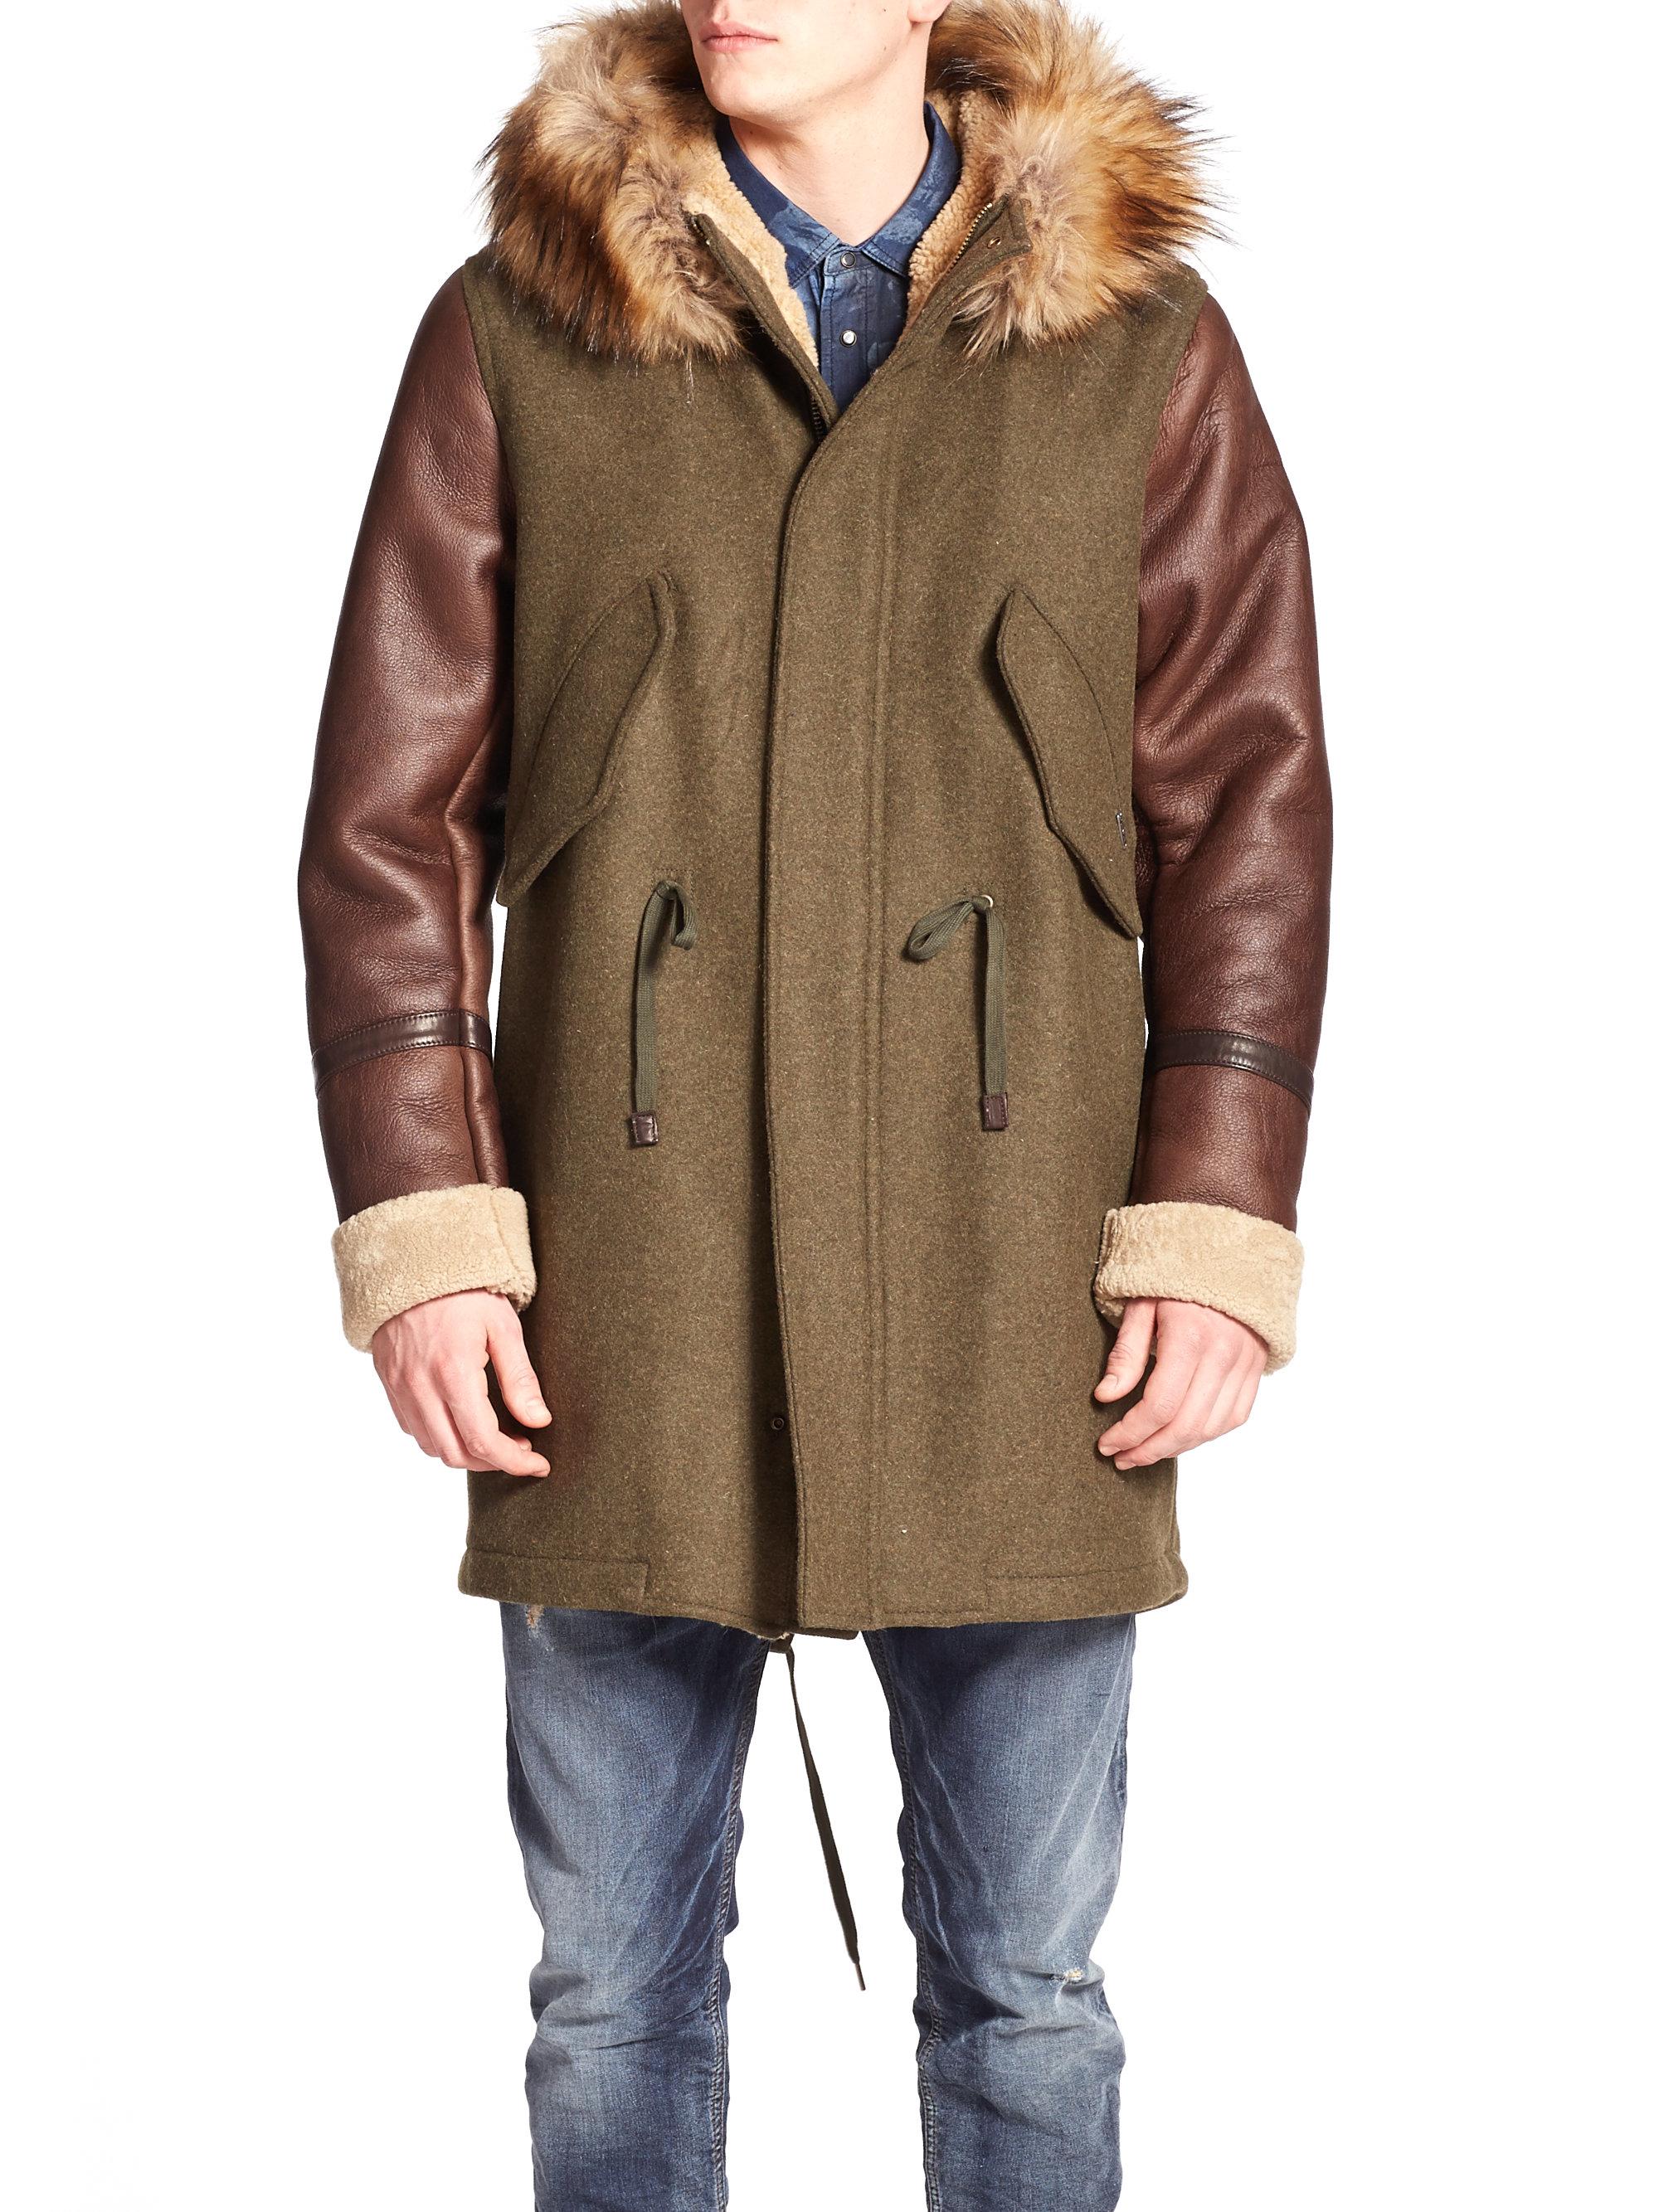 Diesel W-nick Shearling &amp Faux-fur Trimmed Coat in Natural for Men